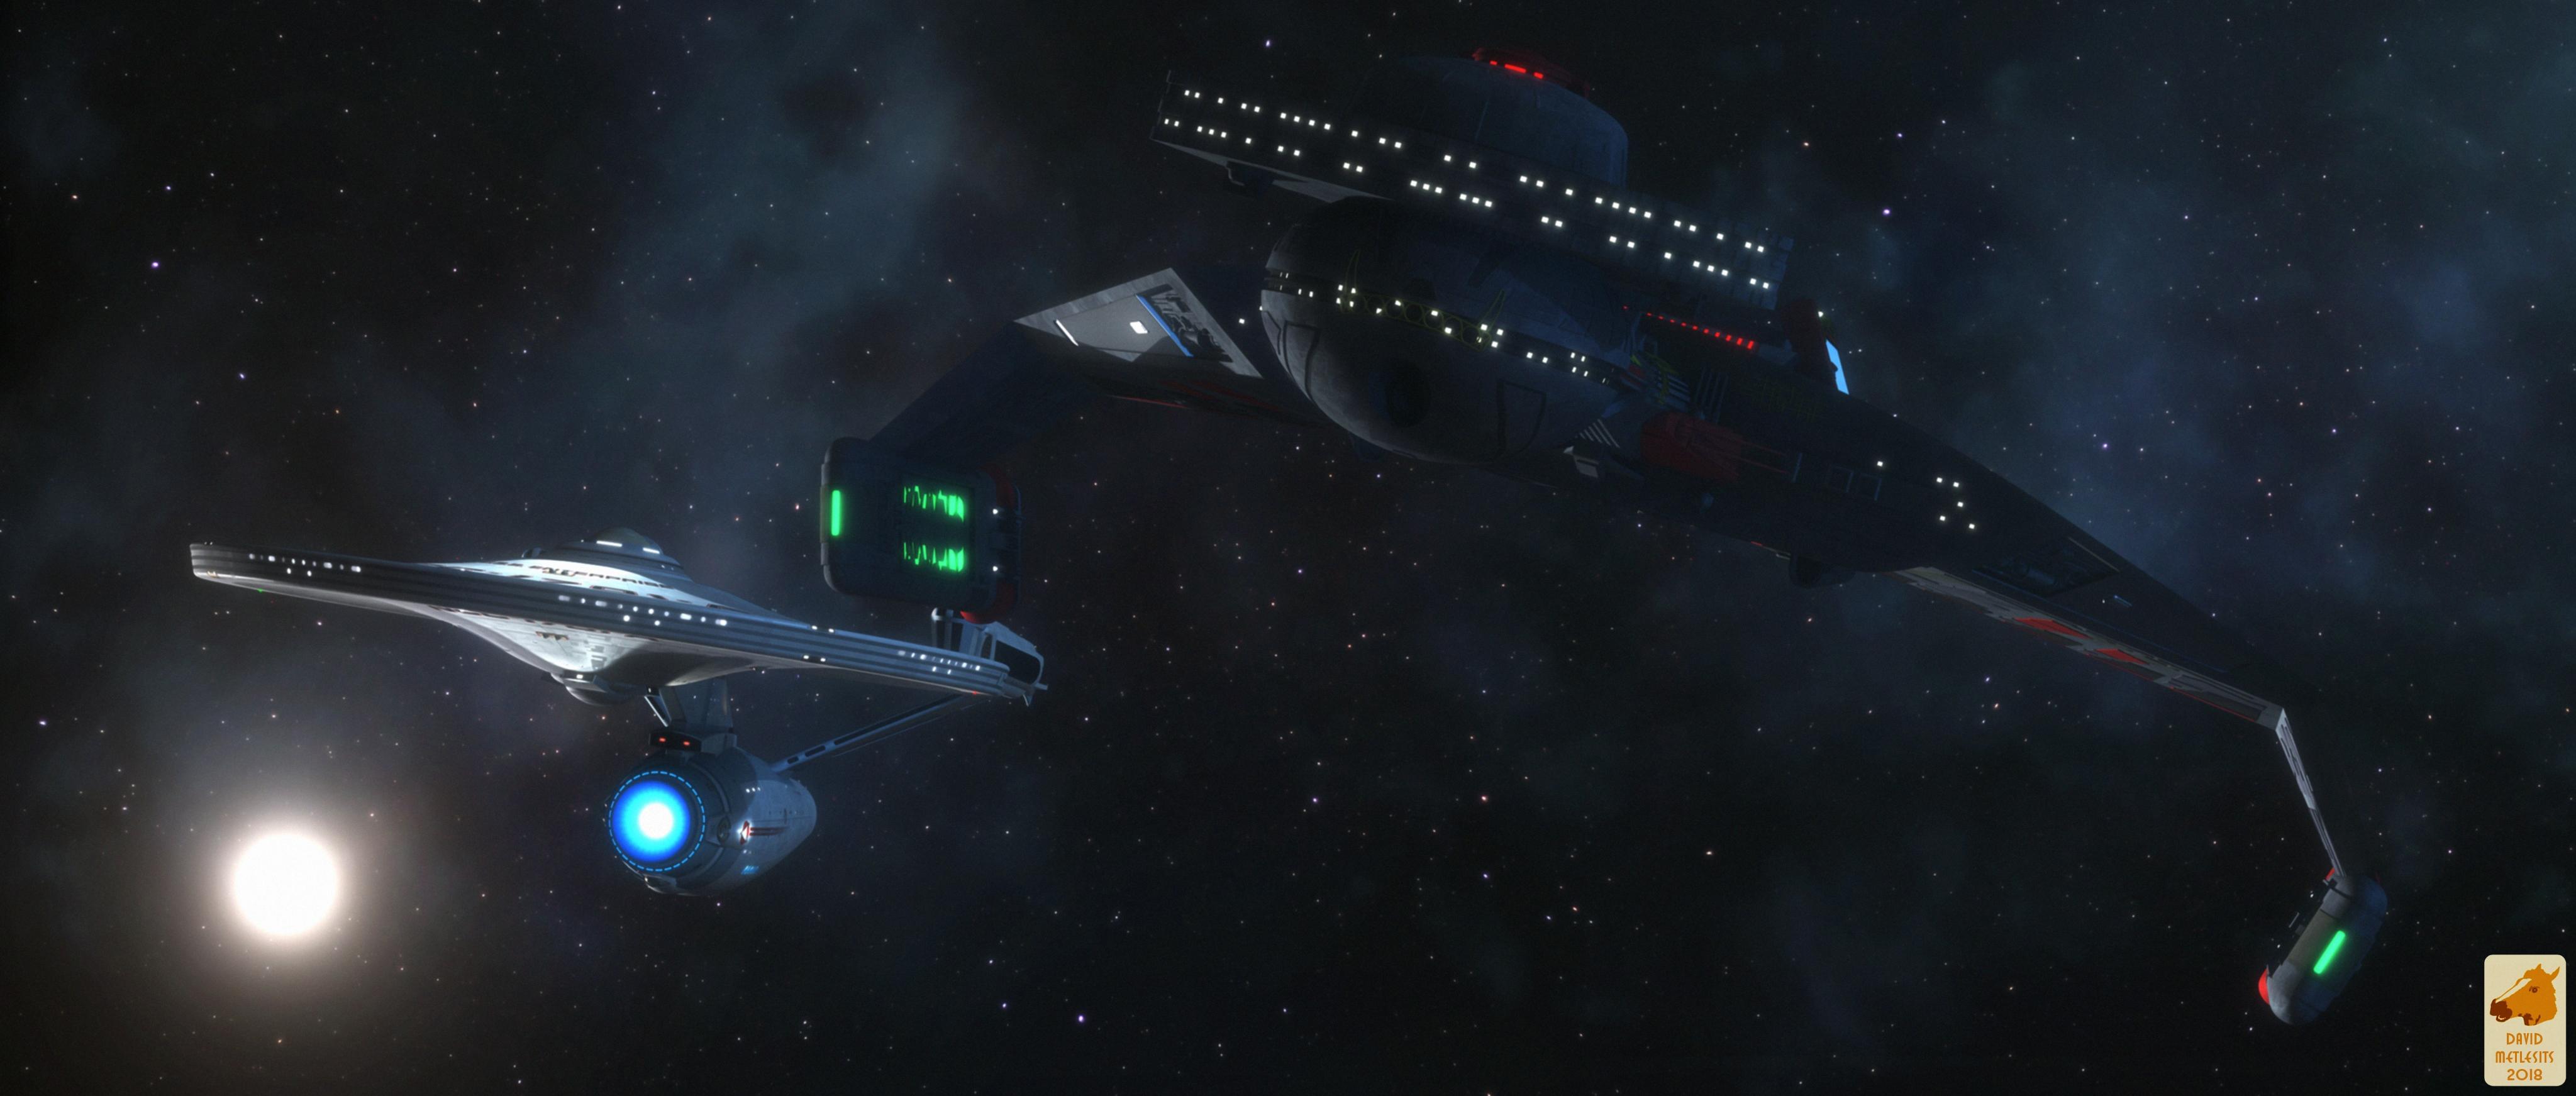 Star Trek Wallpaper A Place To Deposit Desktop